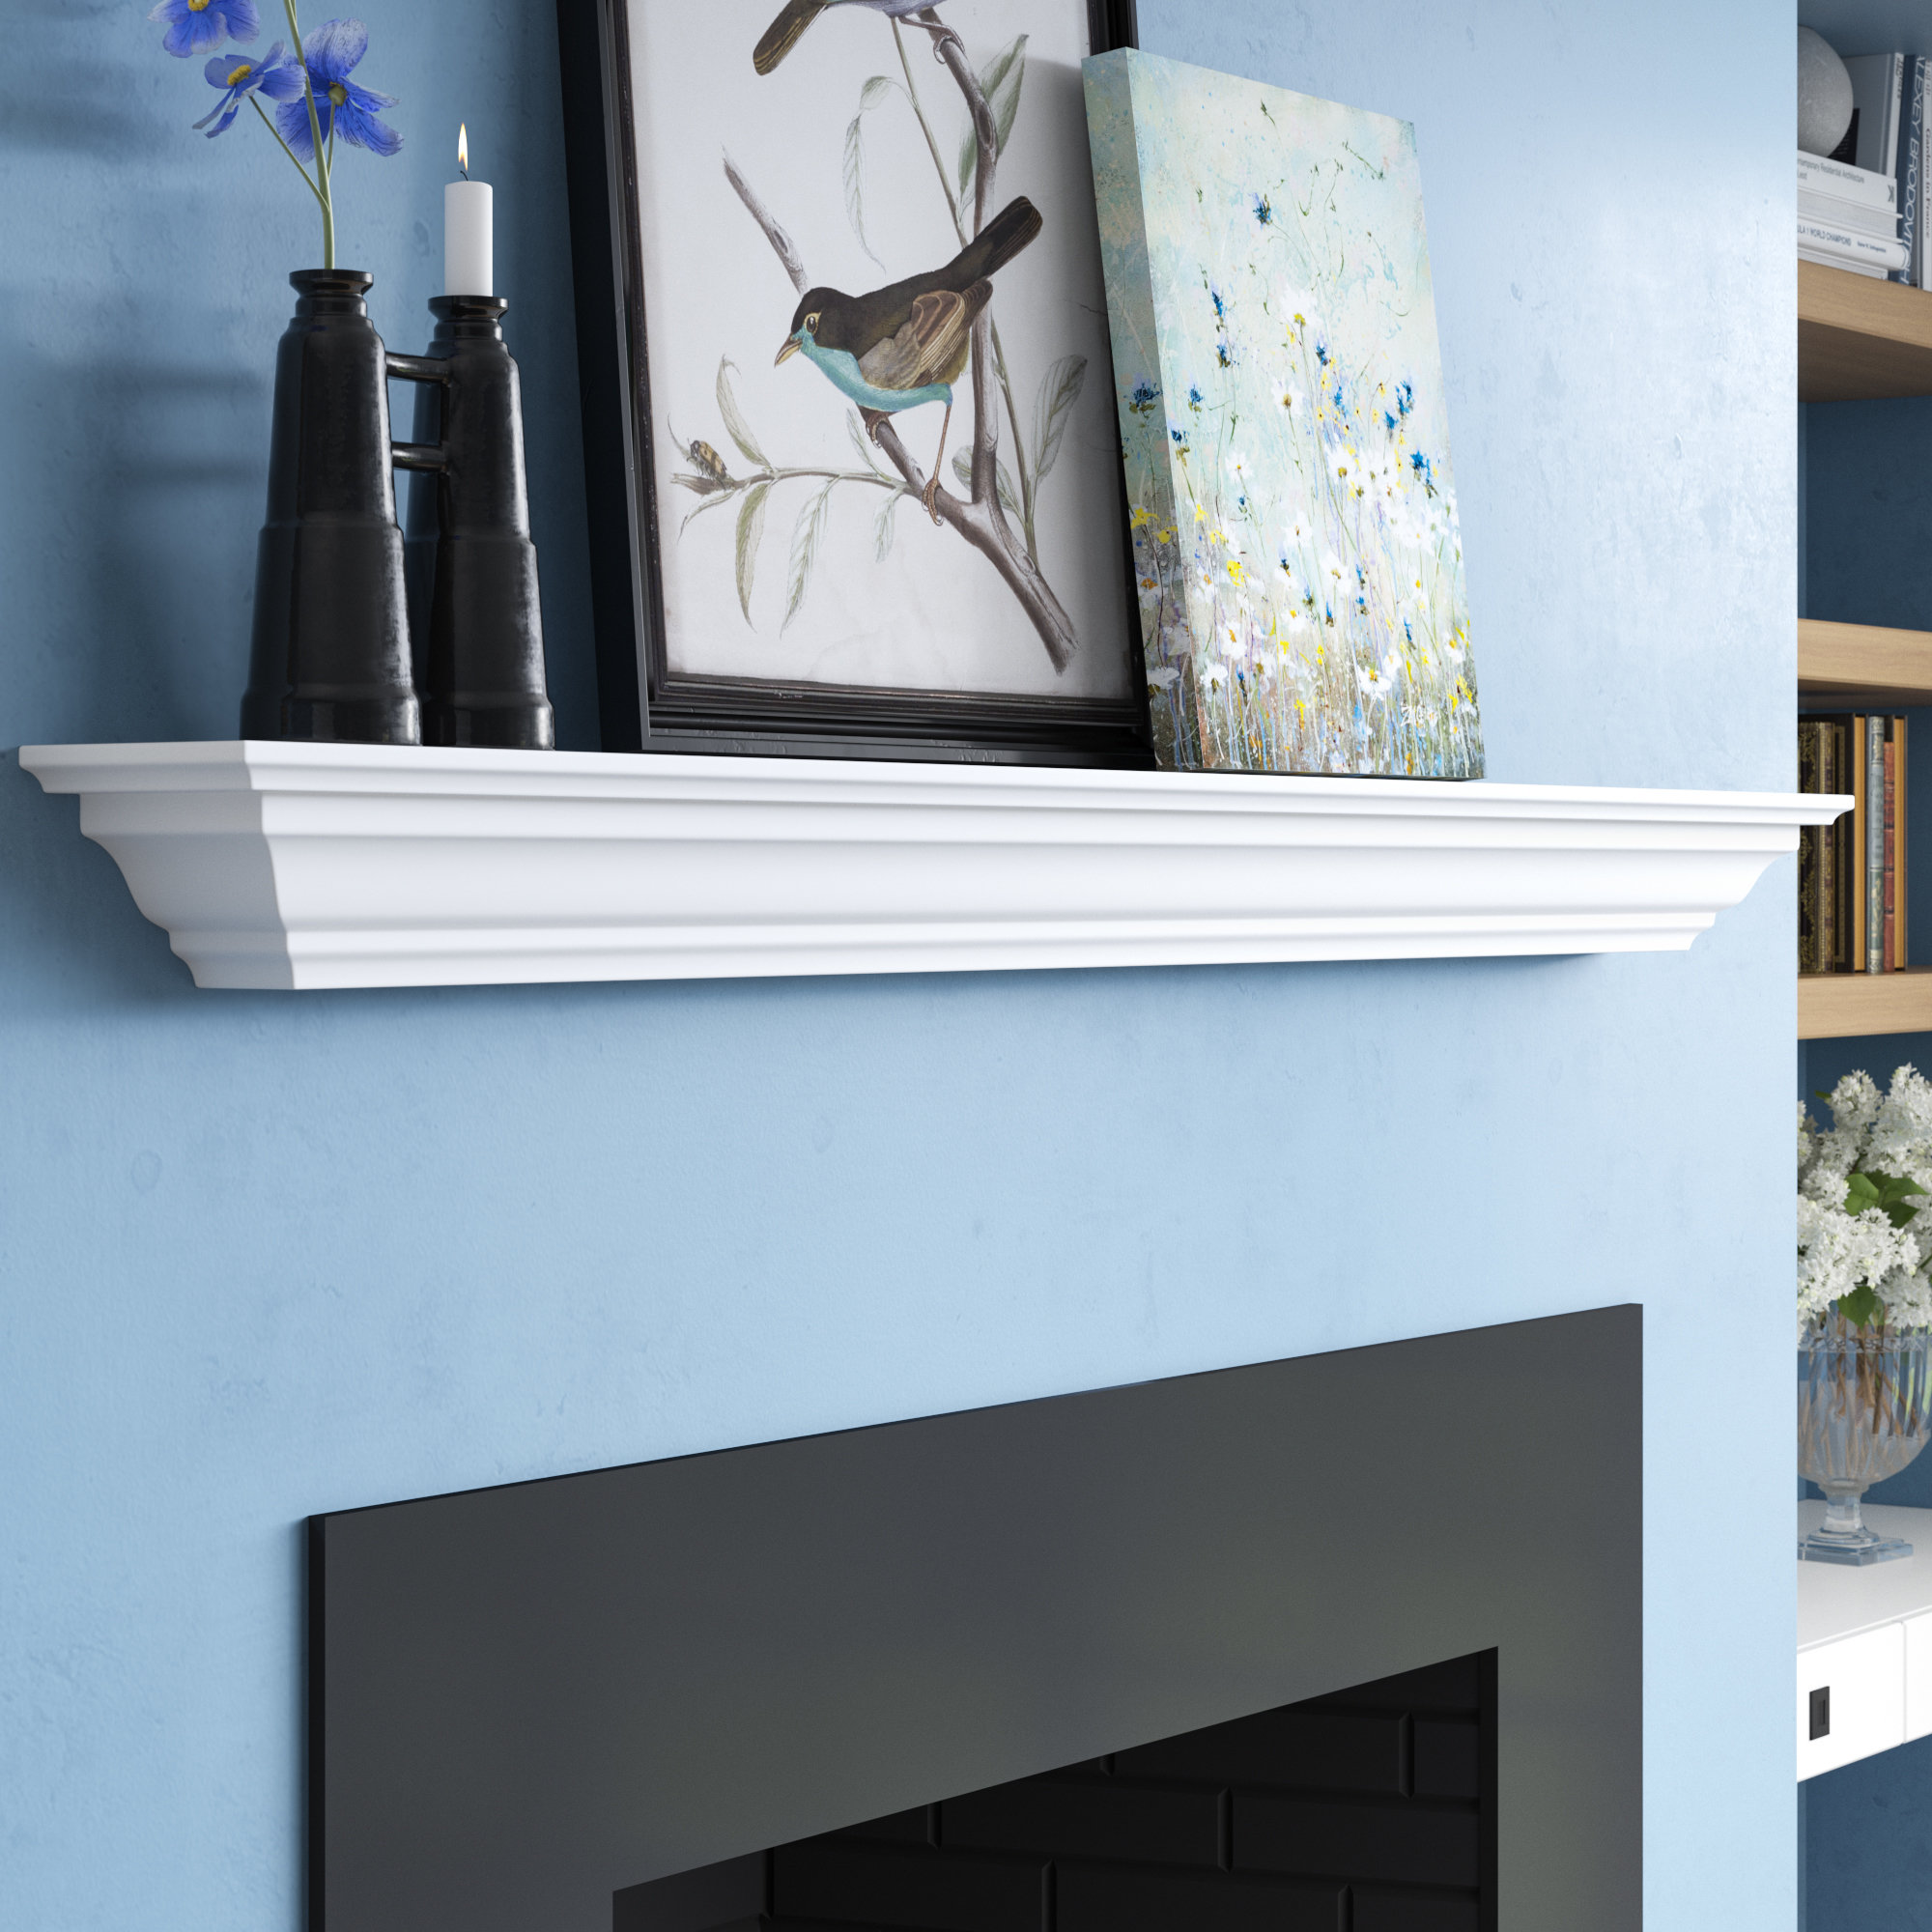 three posts almendarez crown moulding wall shelf molding floating dark wood coat hooks white with vinyl tile flooring installation shower mixer set large bookshelf plans closet